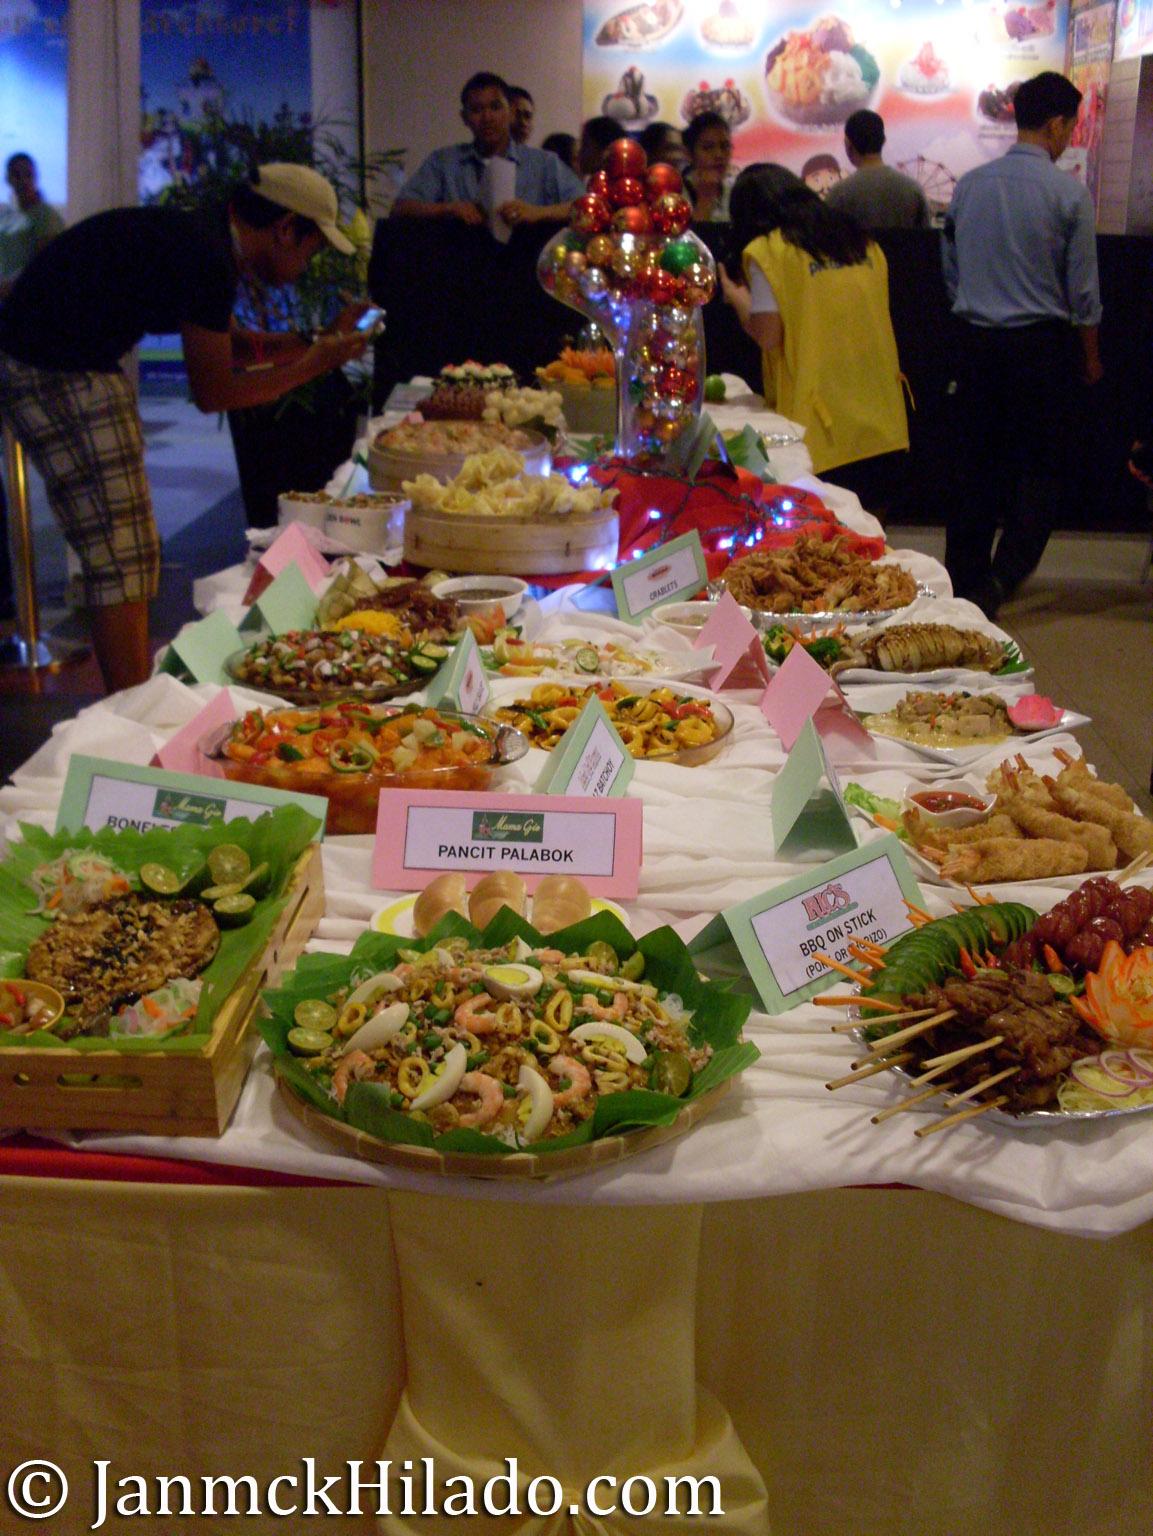 http://3.bp.blogspot.com/_uuBpFeHbjJw/SxOA1rKvYyI/AAAAAAAACZ0/tXZ5O1mcYIo/s1600/SM+City+Cebu+Foodcourt+Food+Bloggers+Event0005.jpg